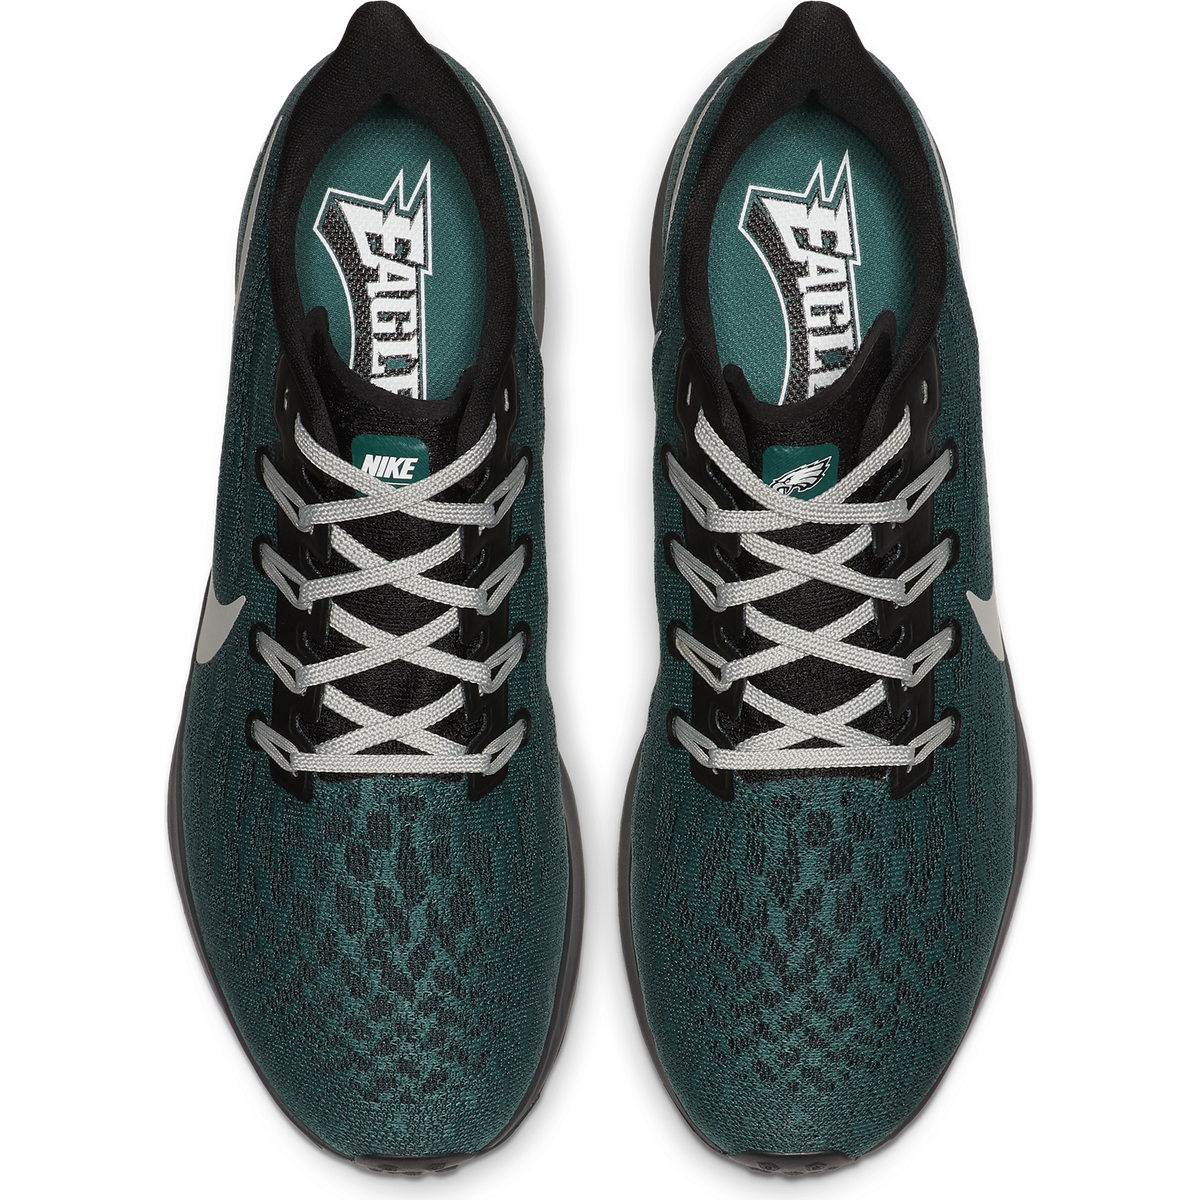 save off 1e404 37f29 Nike drops the new Air Zoom Pegasus 36 Eagles shoe ...